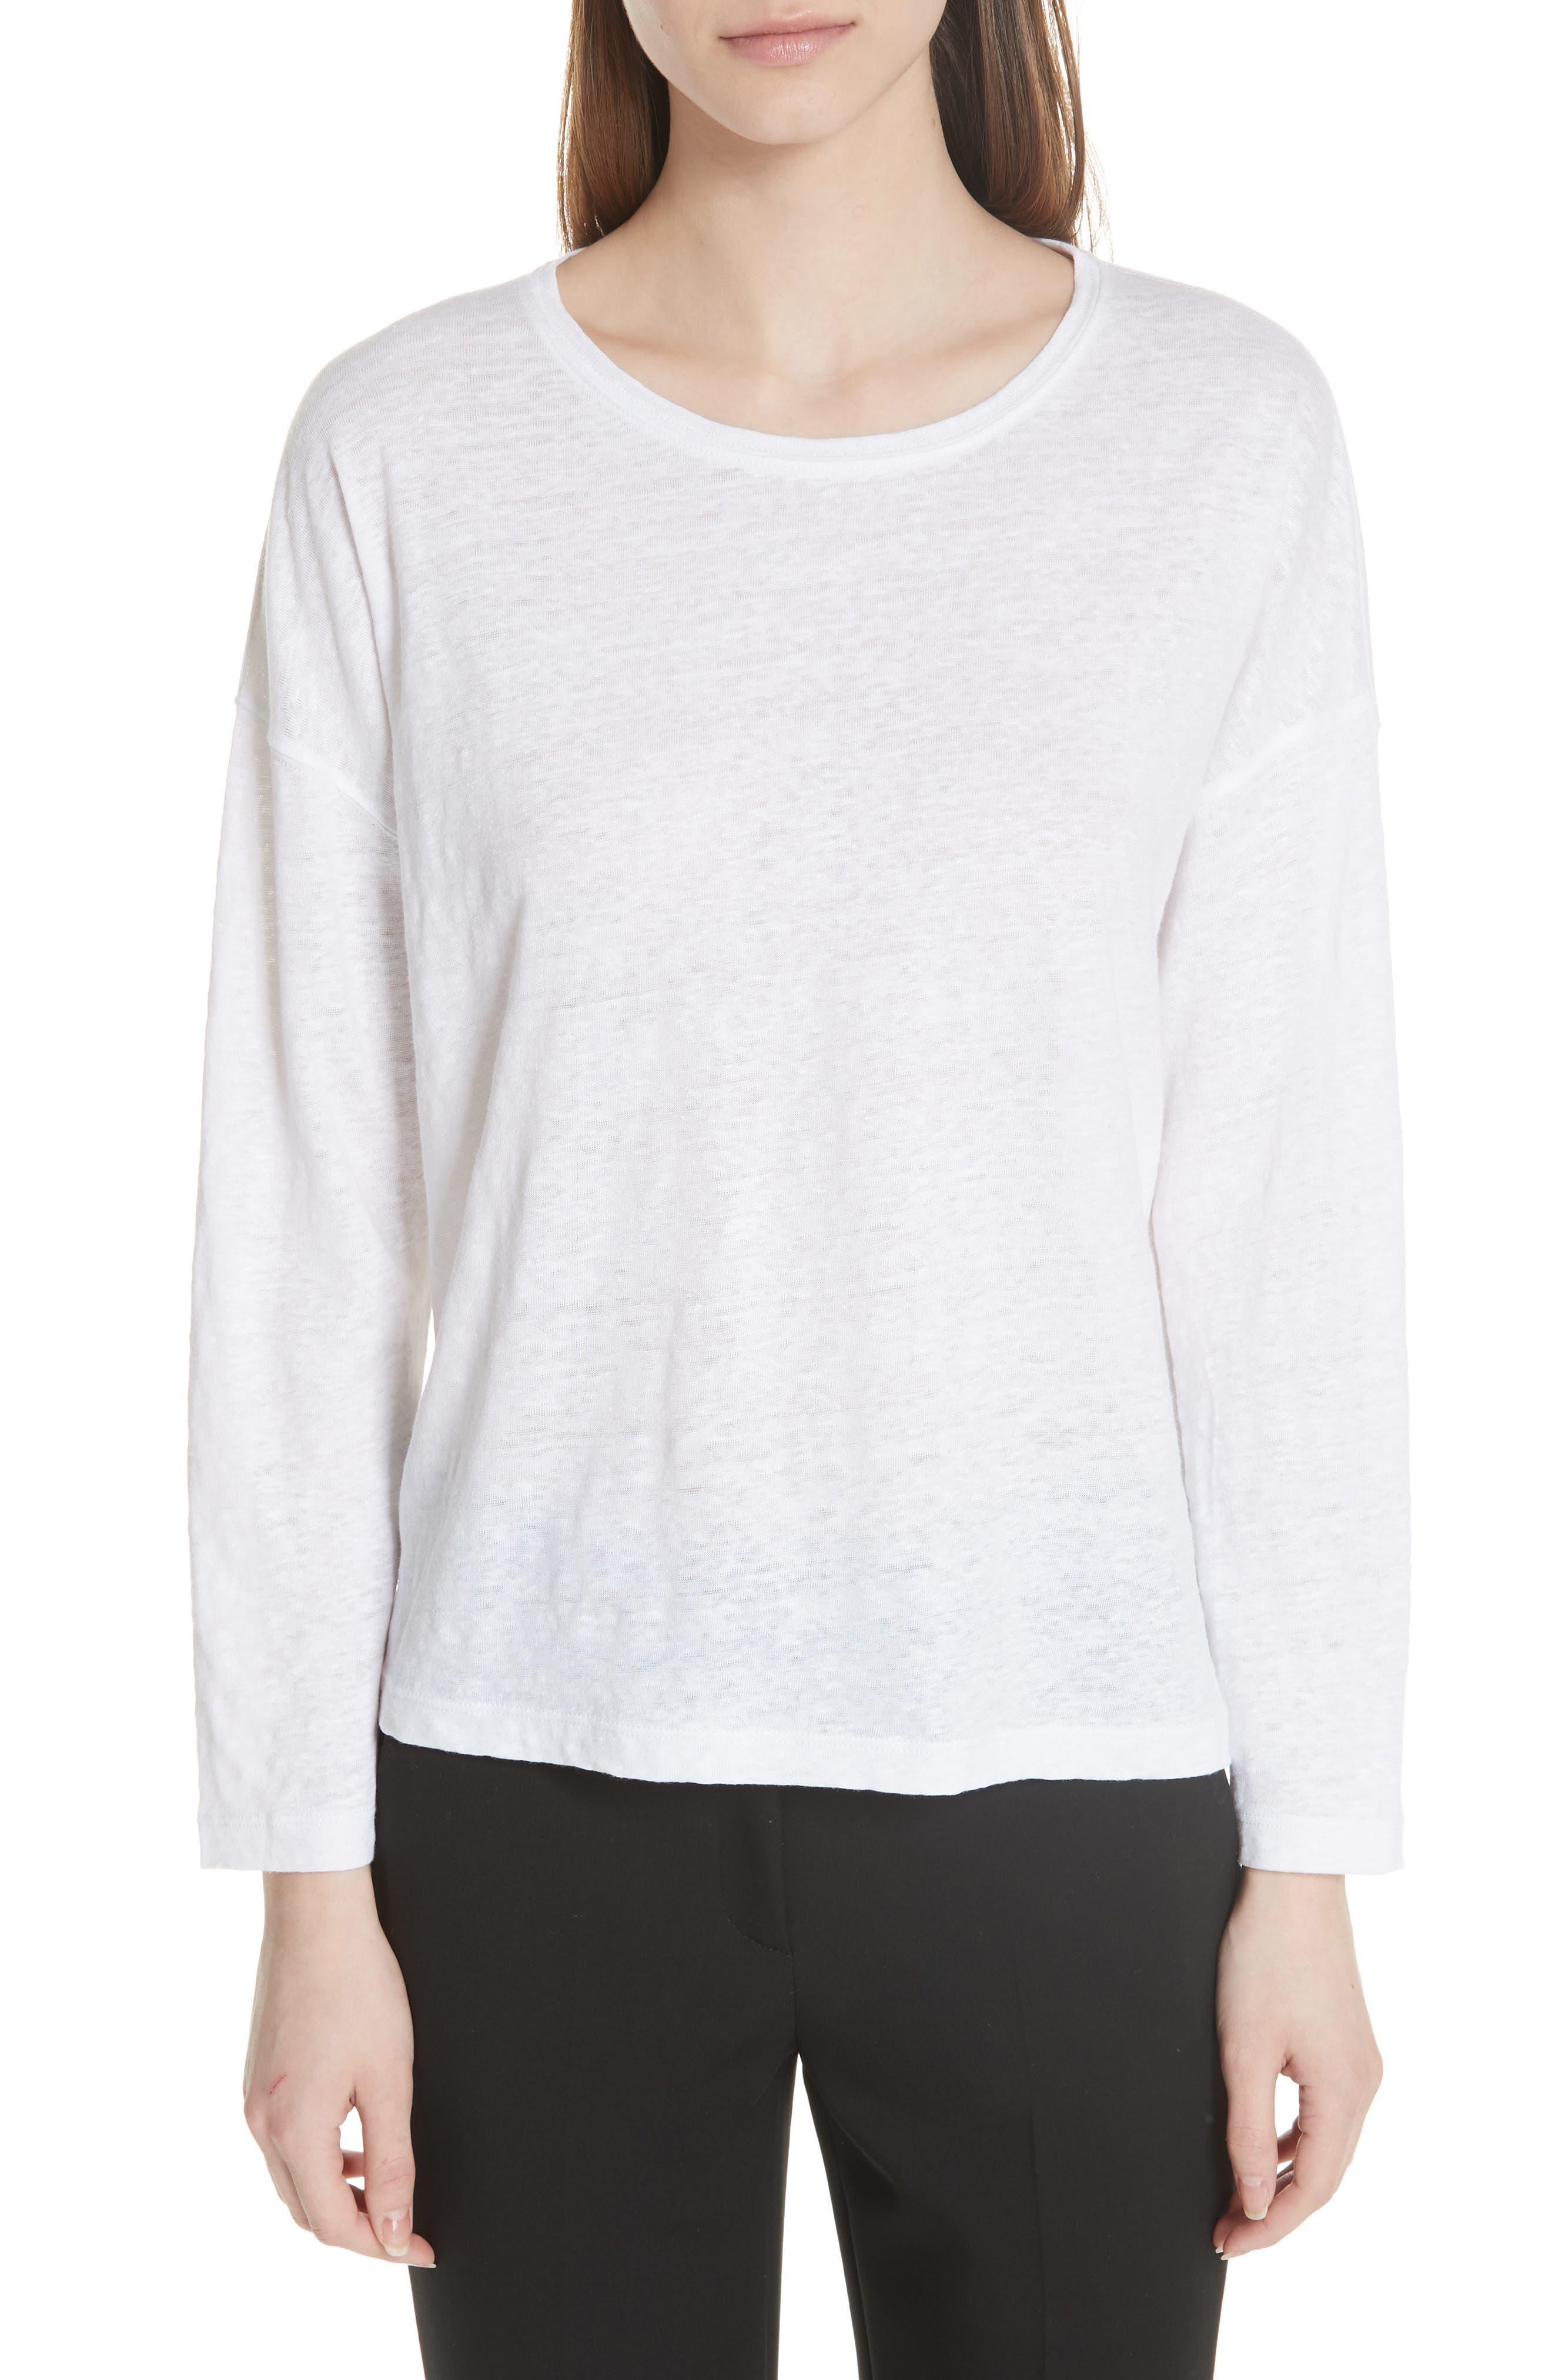 Shrunken Linen Long Sleeve Top,                             Main thumbnail 1, color,                             Optic White